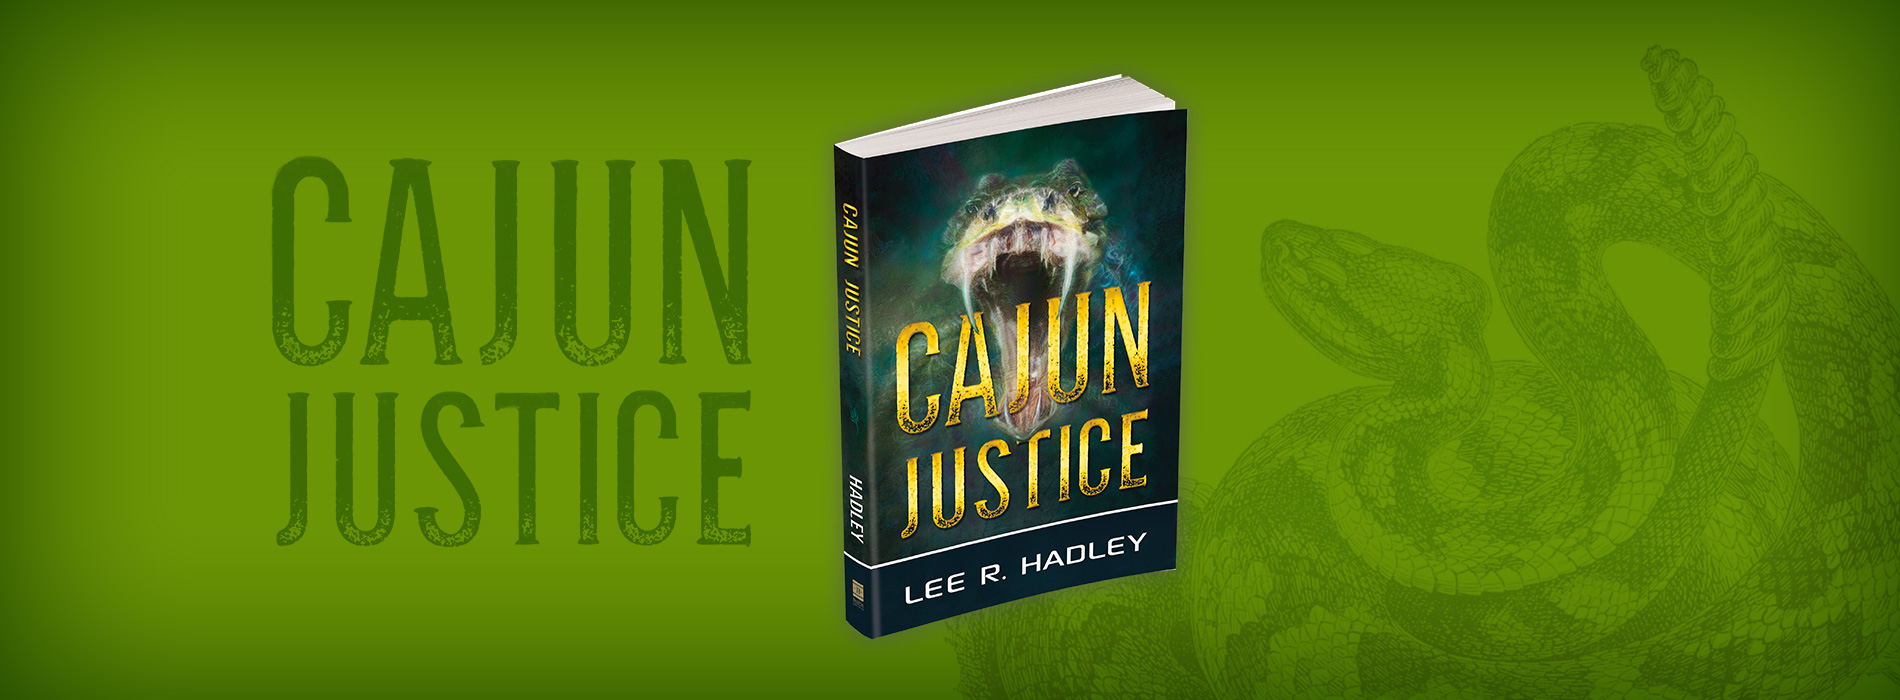 Thriller Novels | Thriller Series | Lee R  Hadley Books